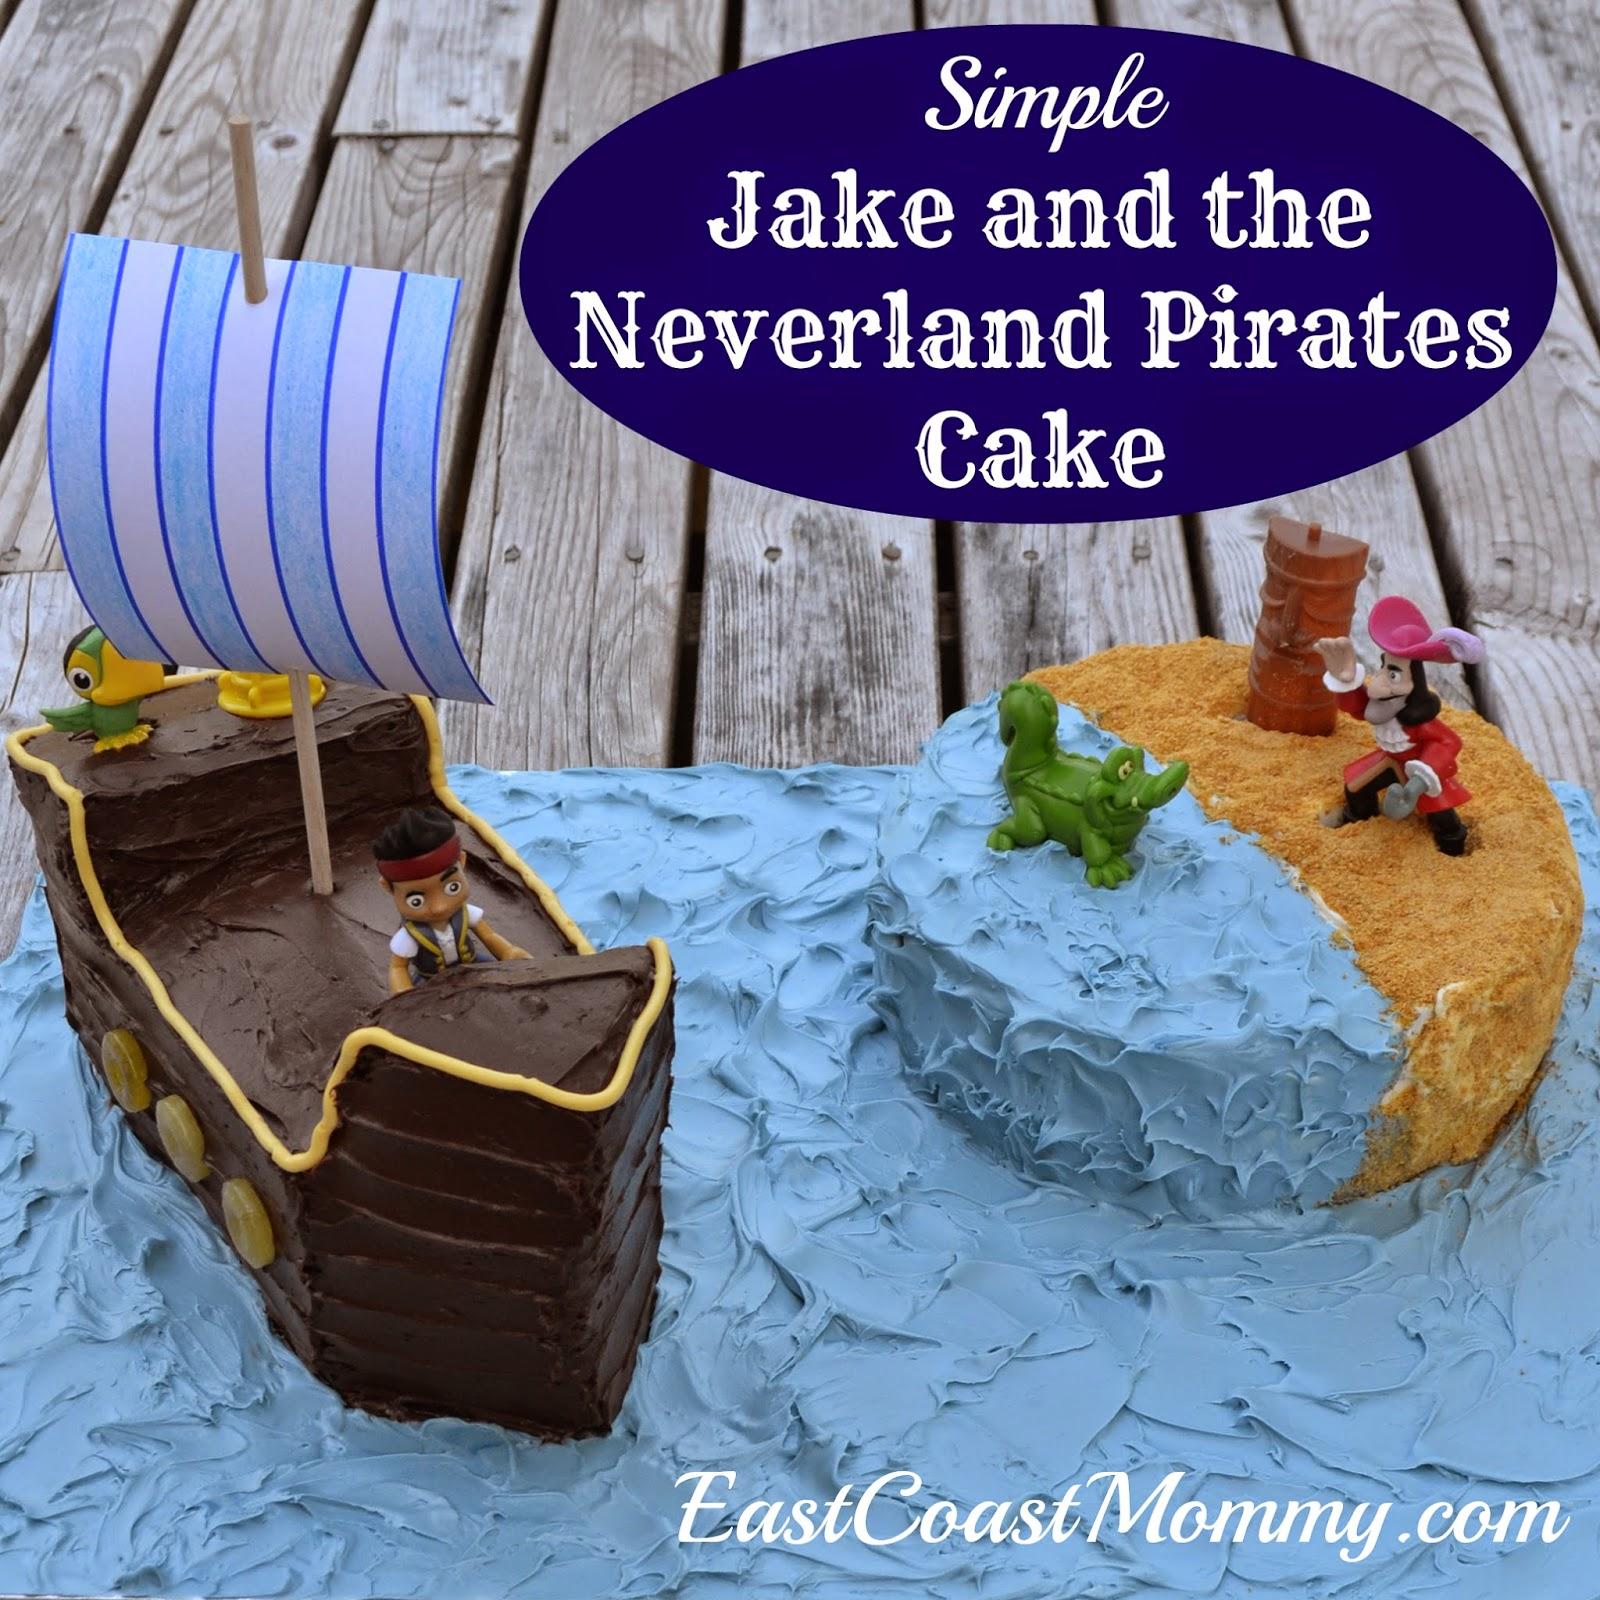 jake and the neverland pirates cake - photo #41